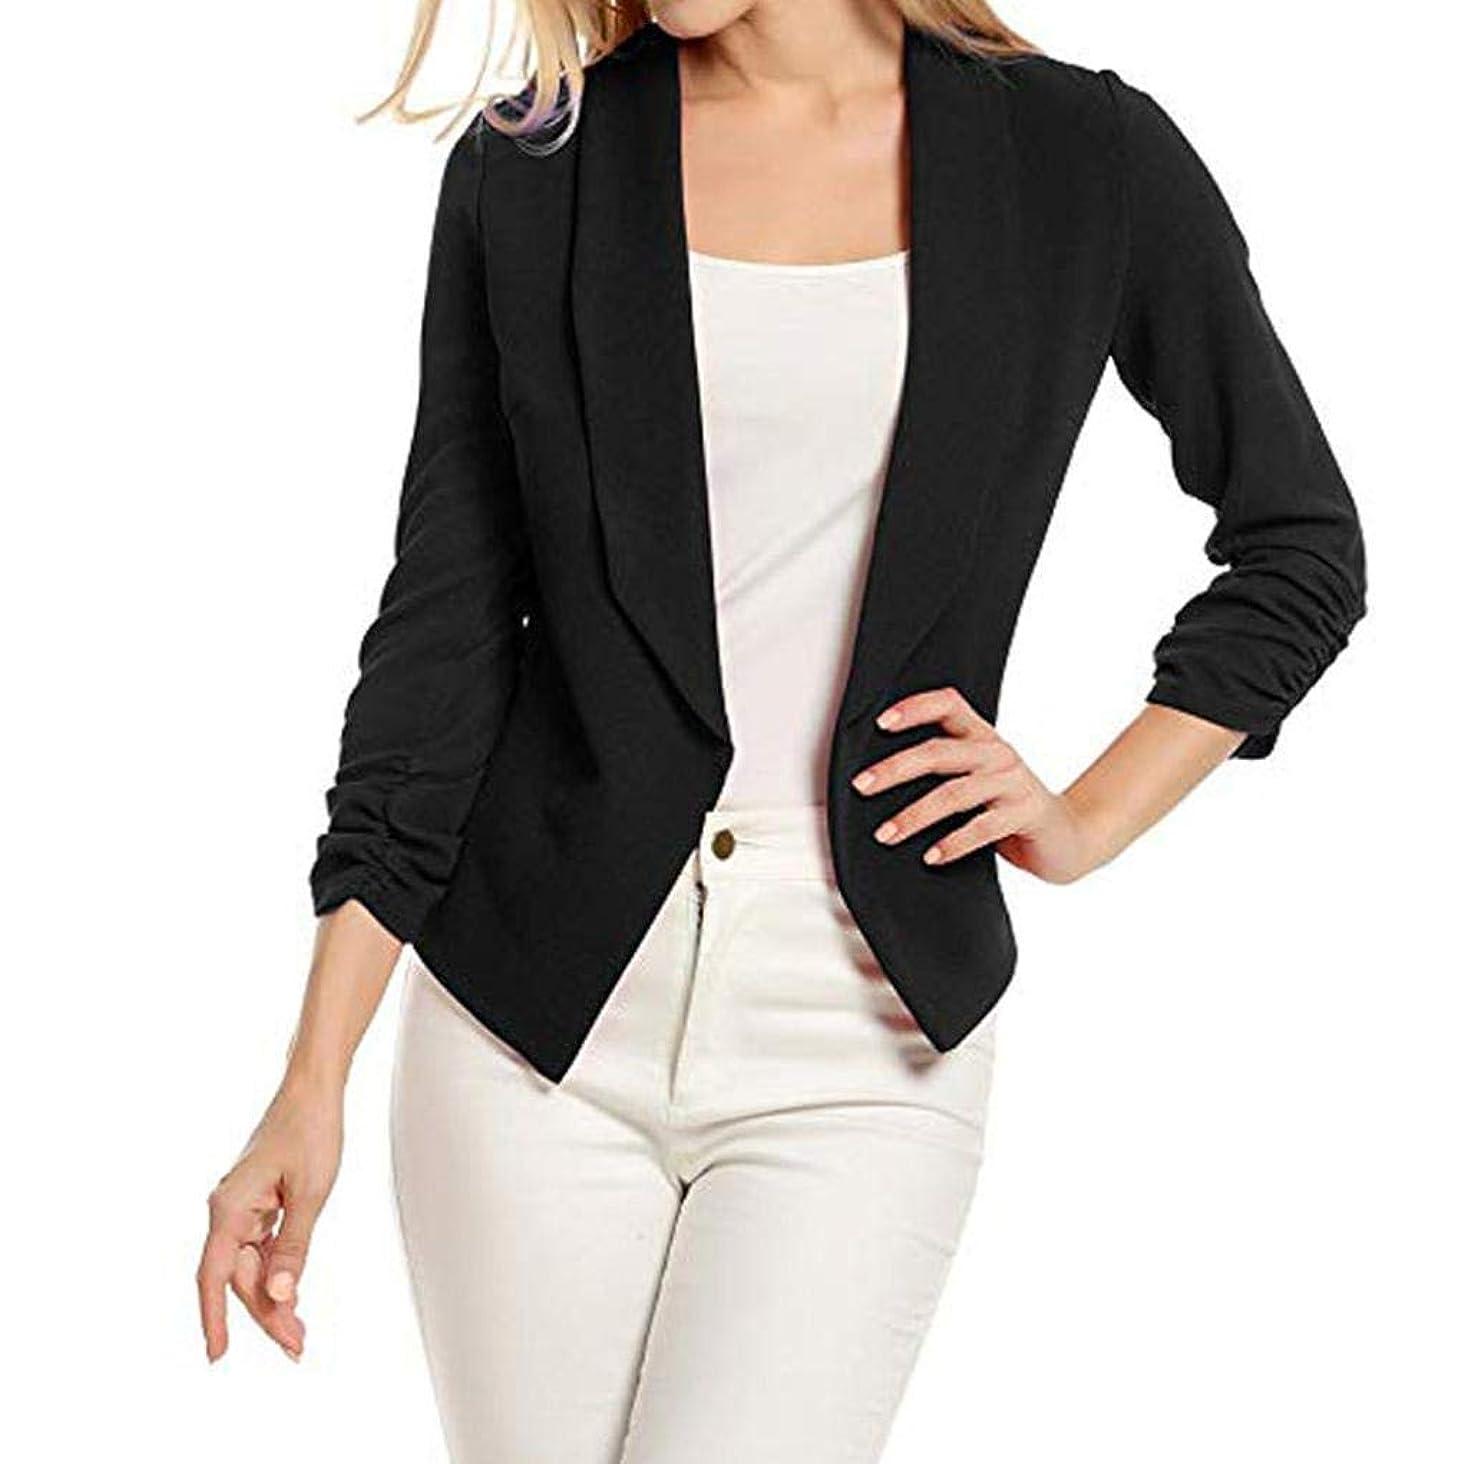 GOVOW 3/4 Sleeve Blazer for Women Open Front Short Cardigan Suit Jacket Work Office Coat